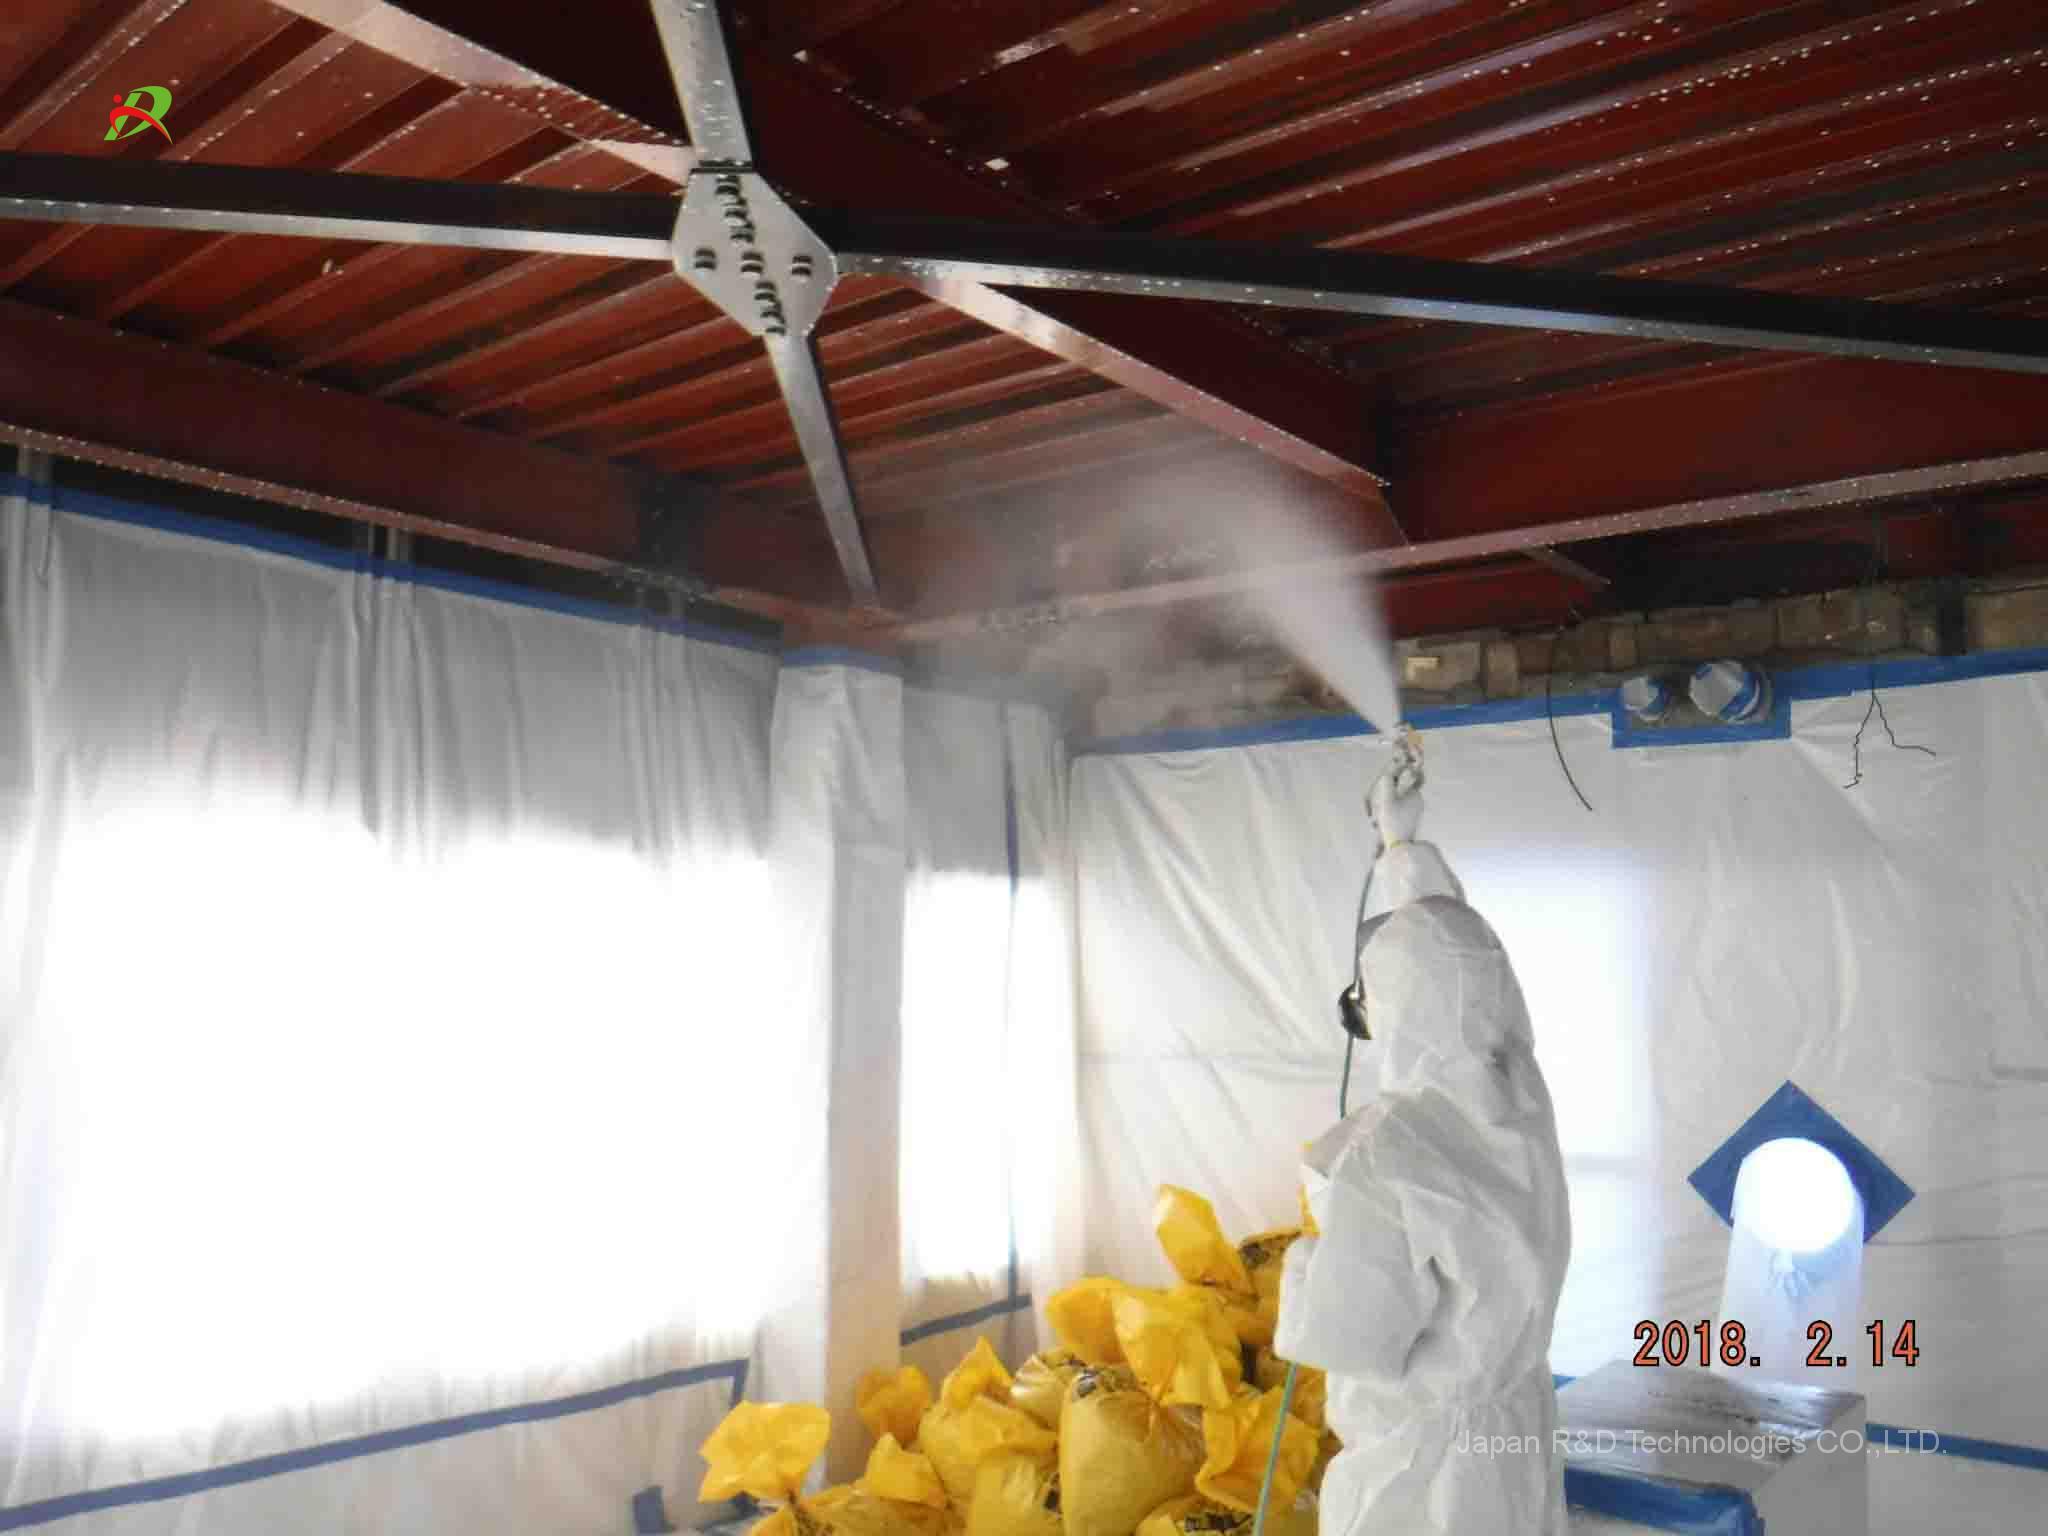 立川市 柴崎町 石綿含有吹き付け材除去工事